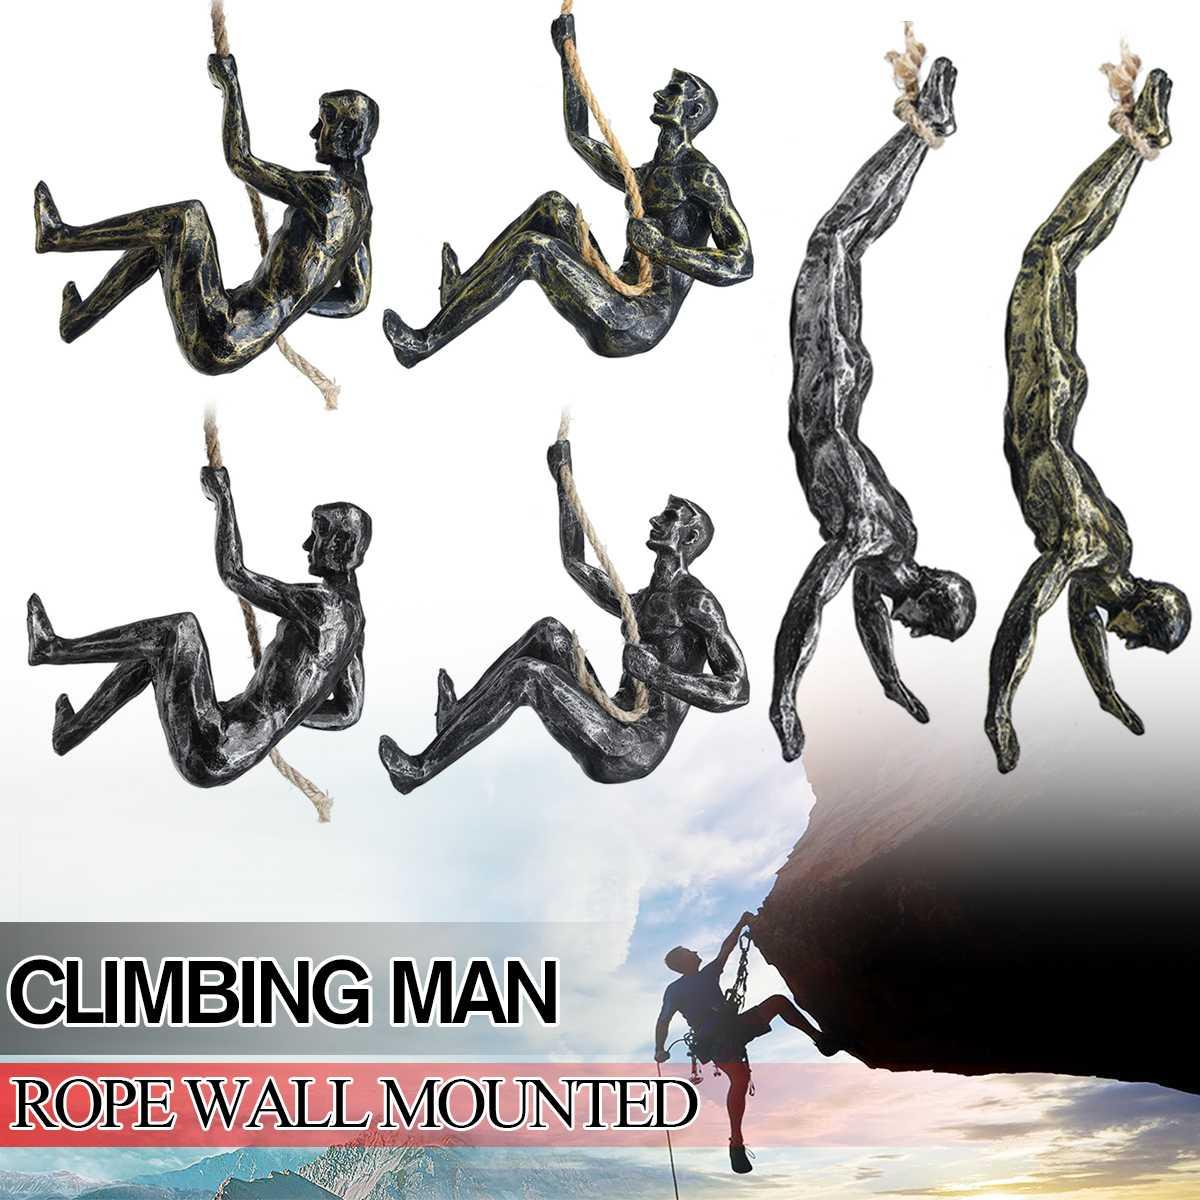 Hecho a mano Global escalada hombre resina Alambre de hierro decoración colgante de pared figuras de escultura creativo Retro regalo estatua Decoración